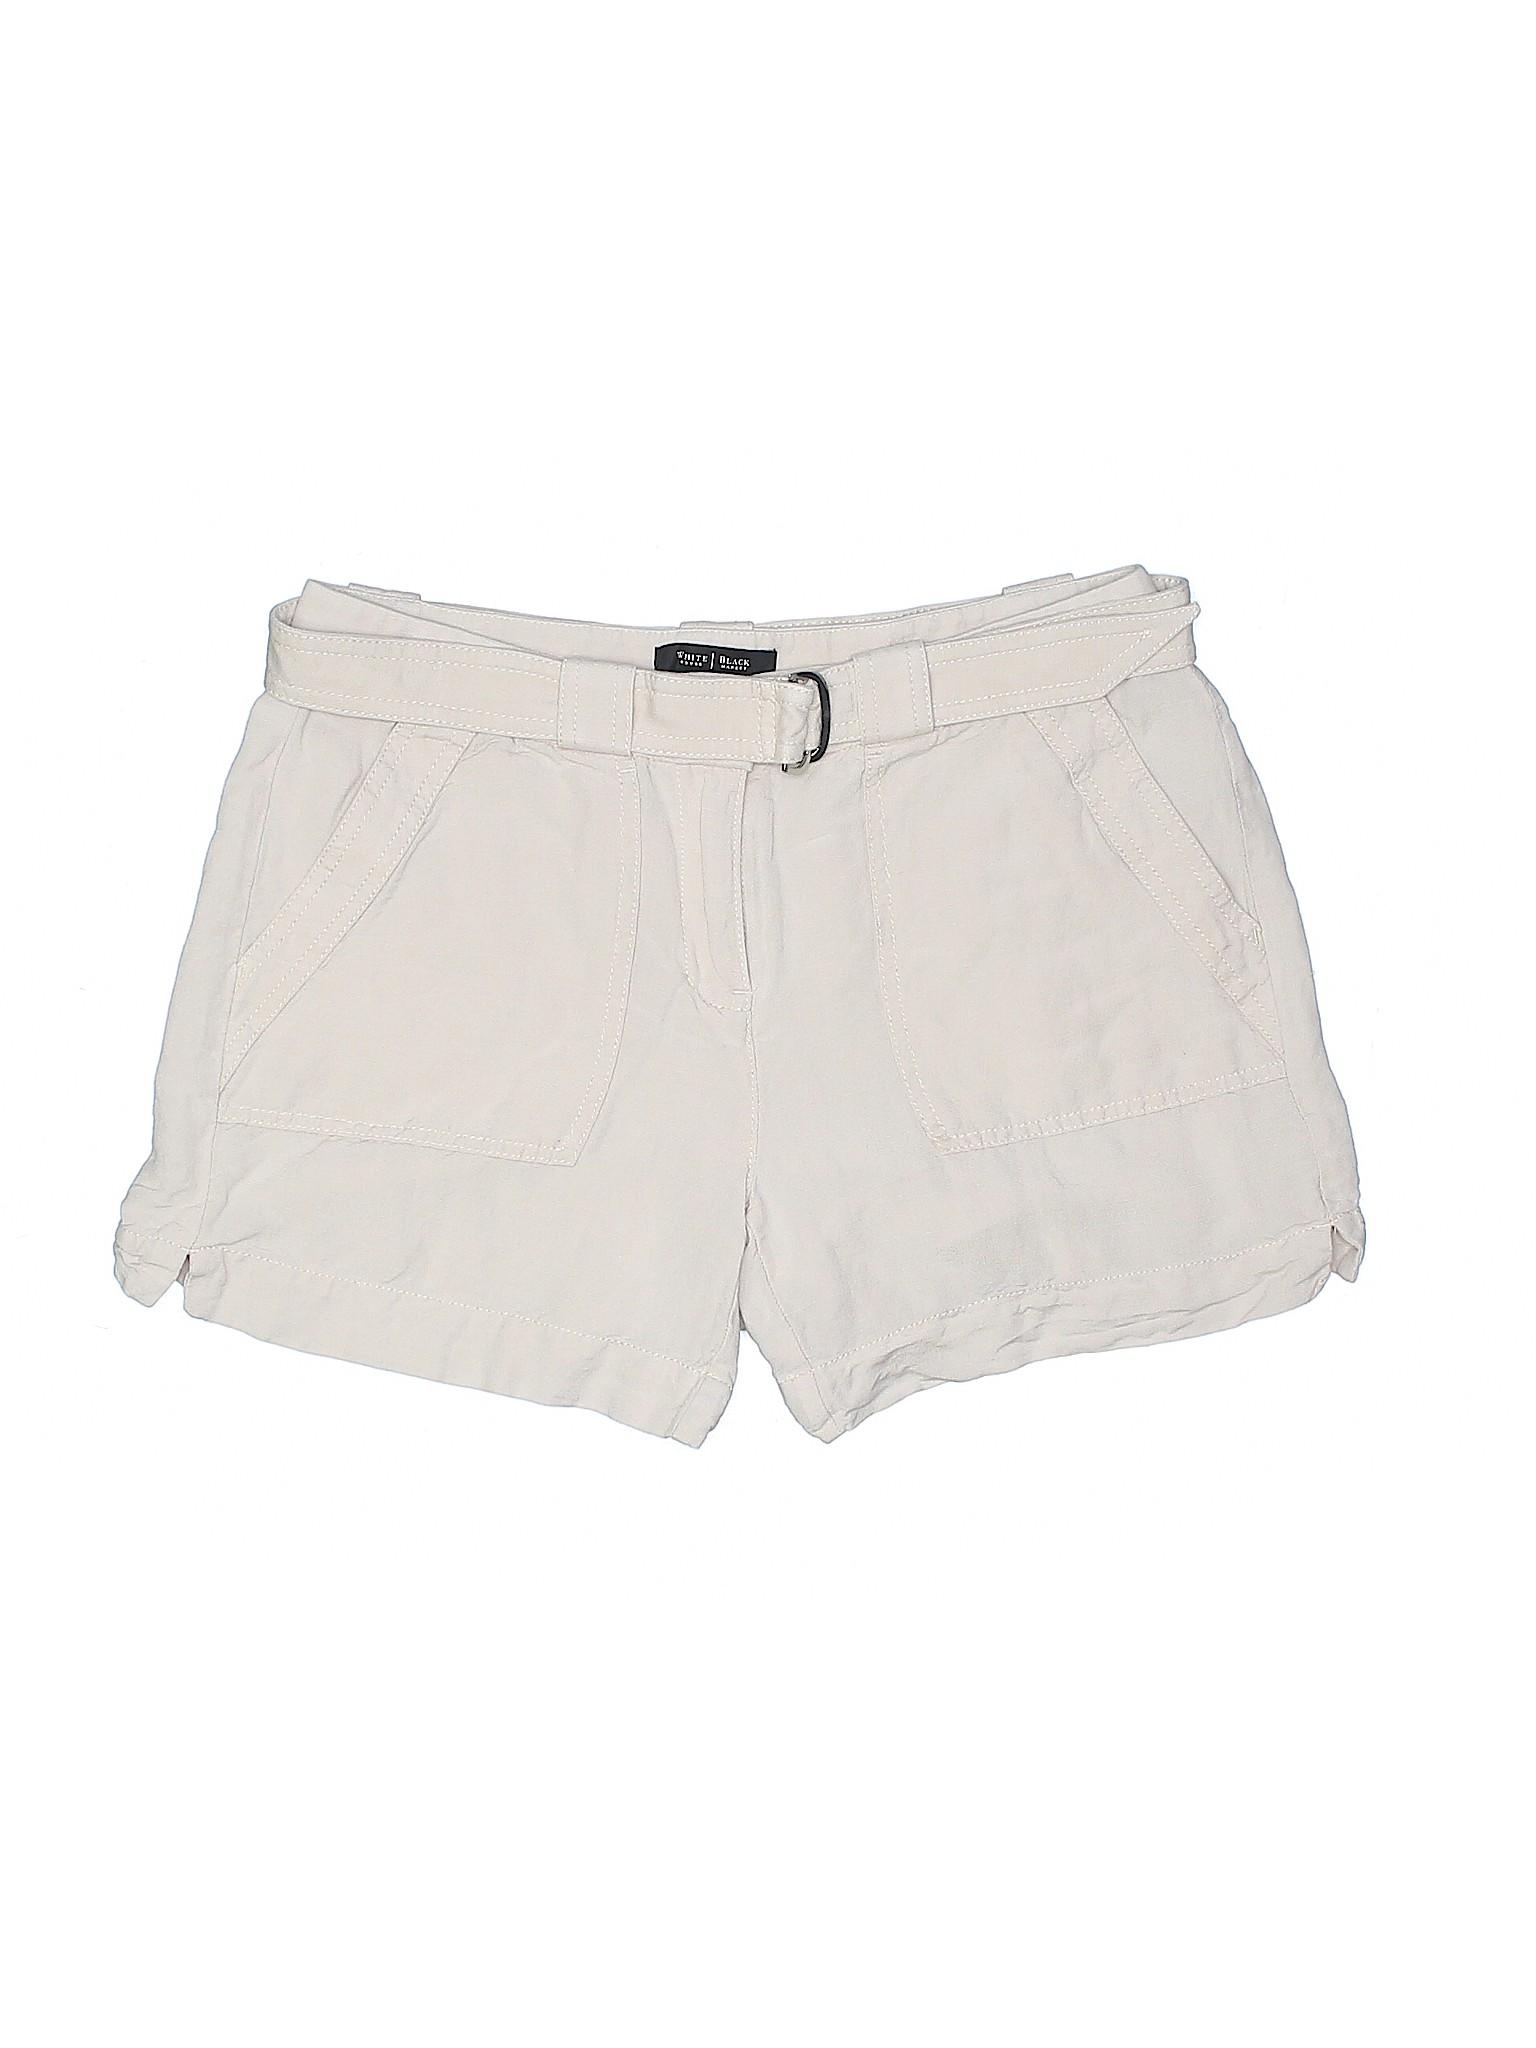 Shorts Black White Boutique House Market HTSwn04